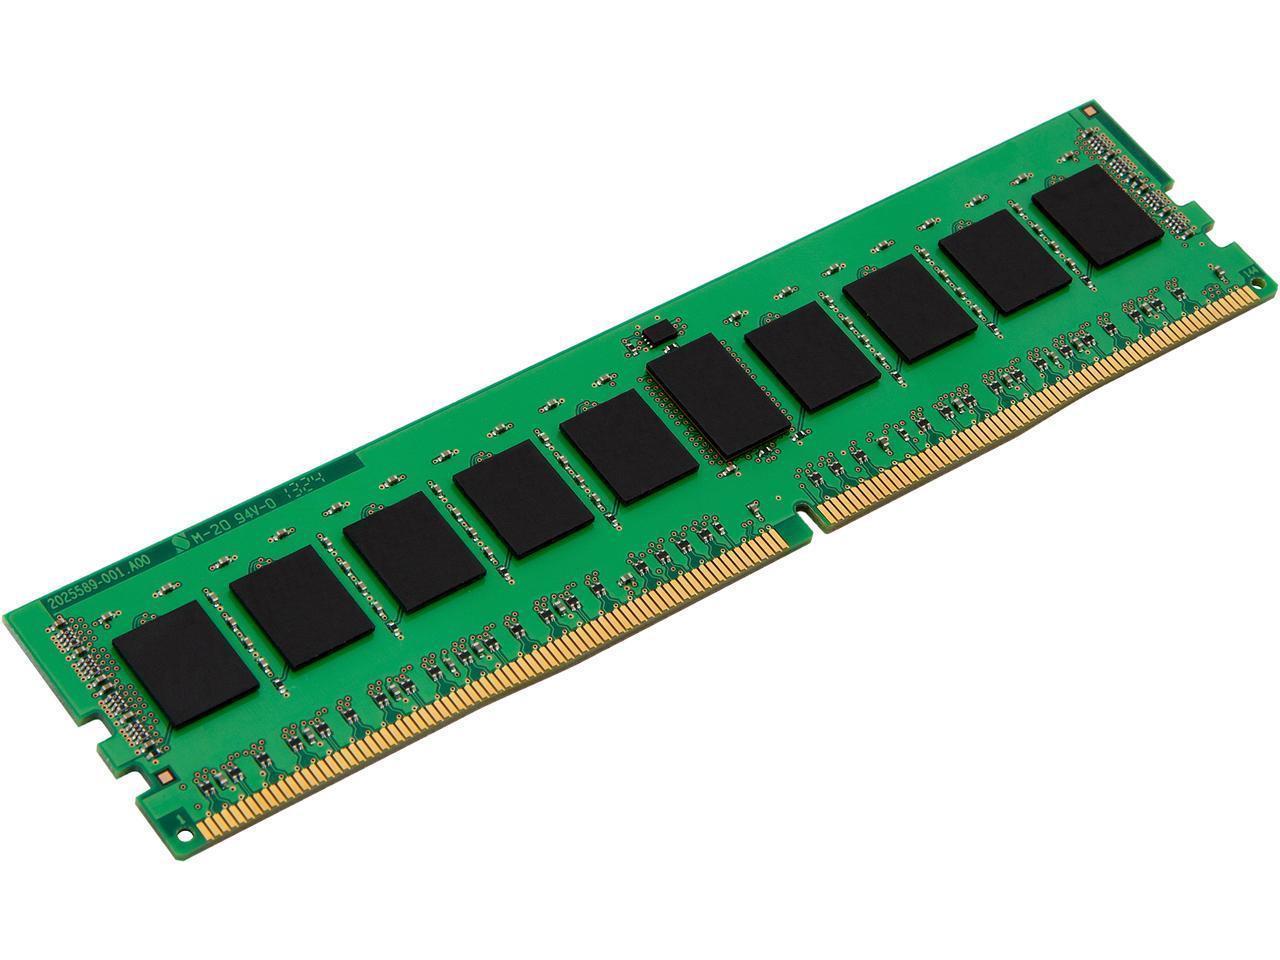 Памет Kingston 8GB DDR4 PC4-21300 2666MHz CL19 KVR26N19S8/8